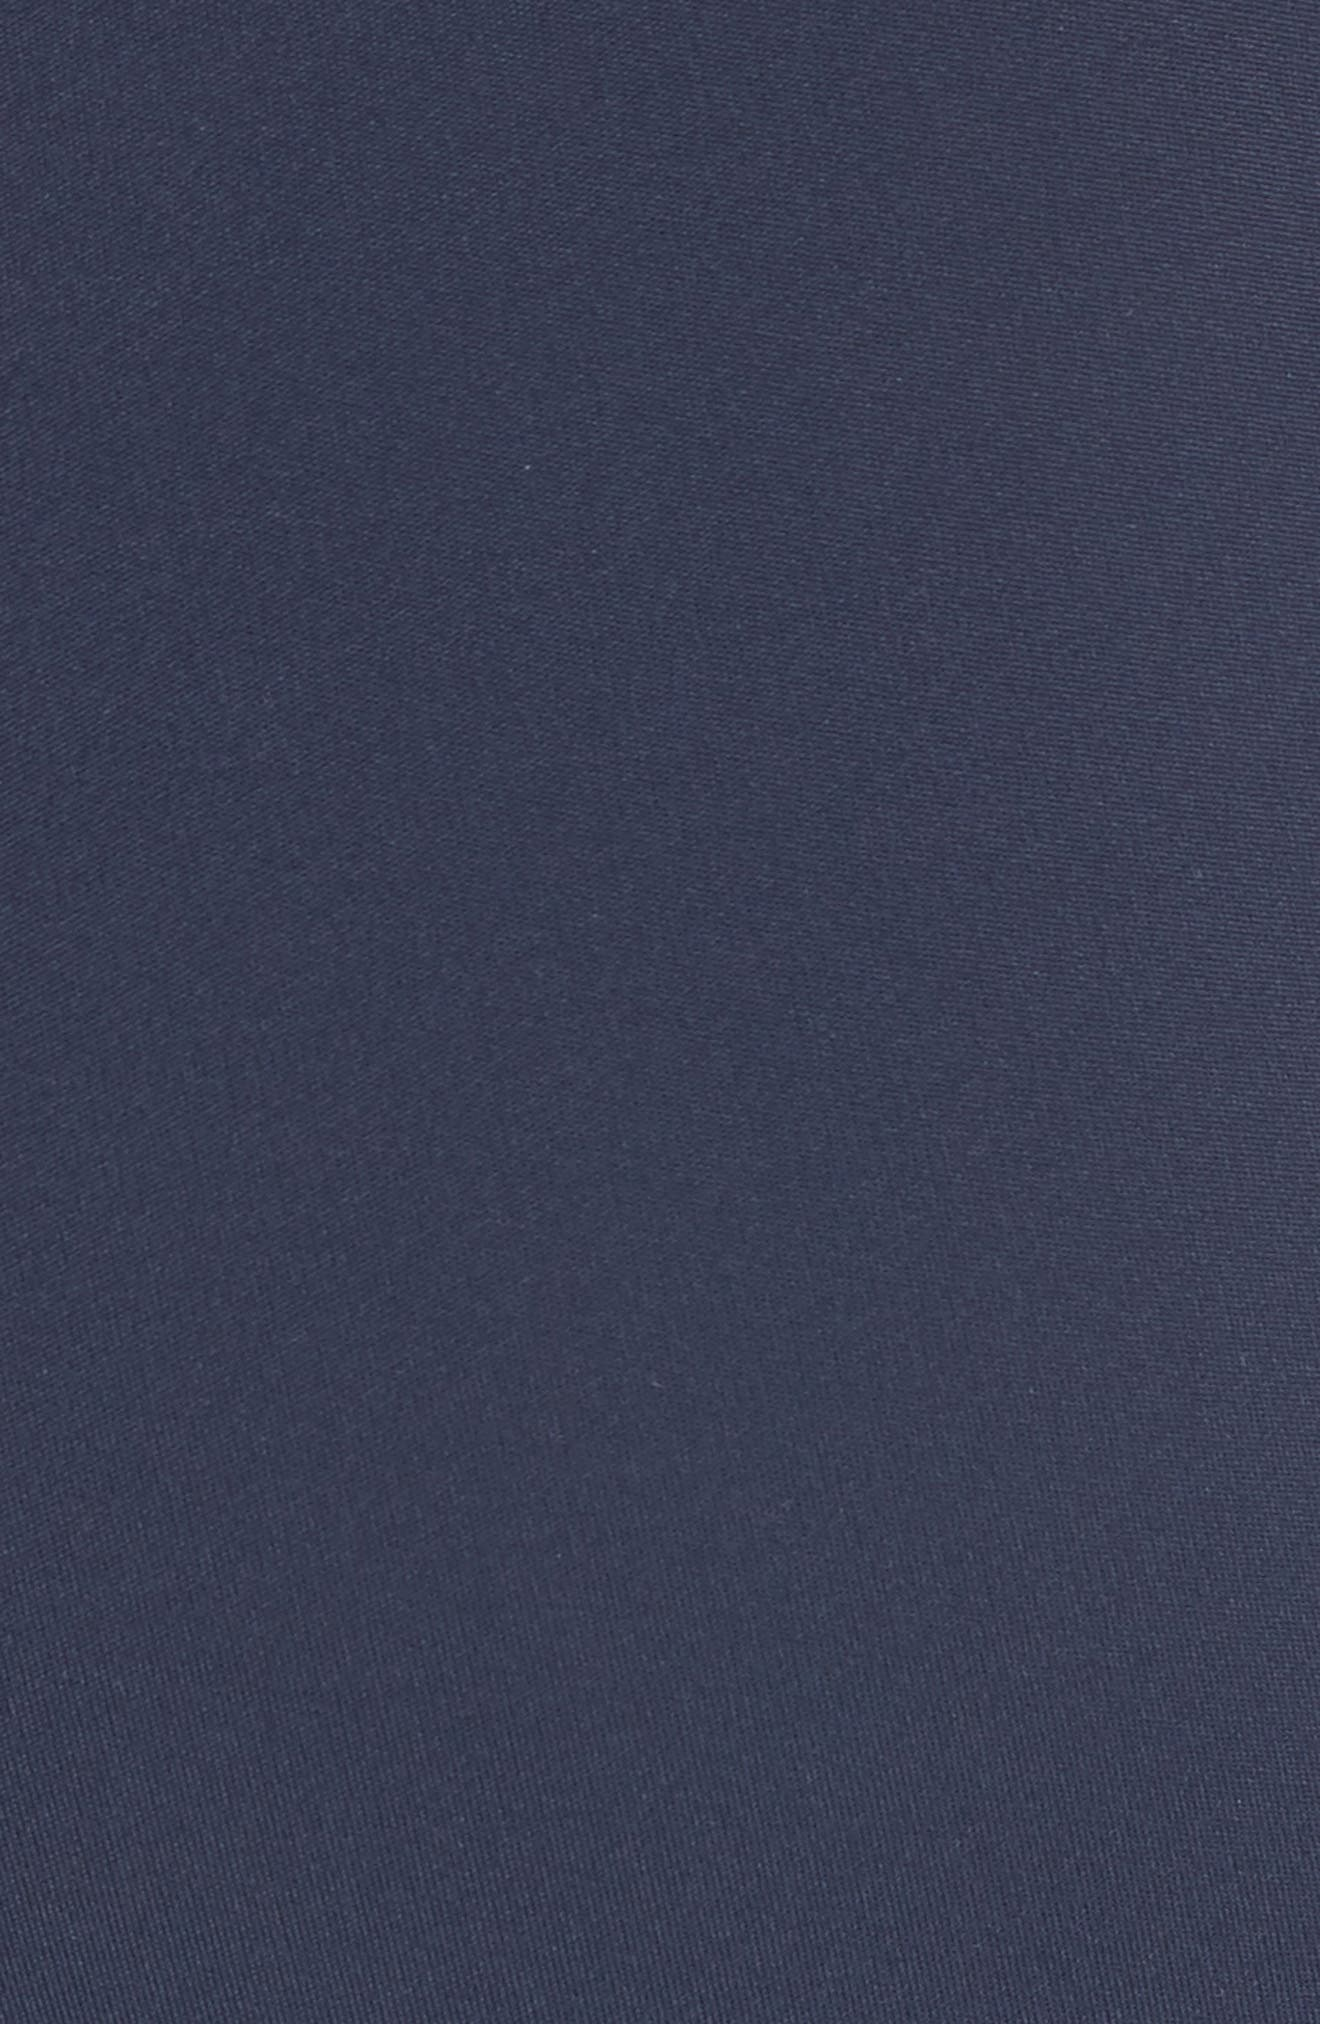 Diagonal Stripe Leggings,                             Alternate thumbnail 5, color,                             Tory Navy